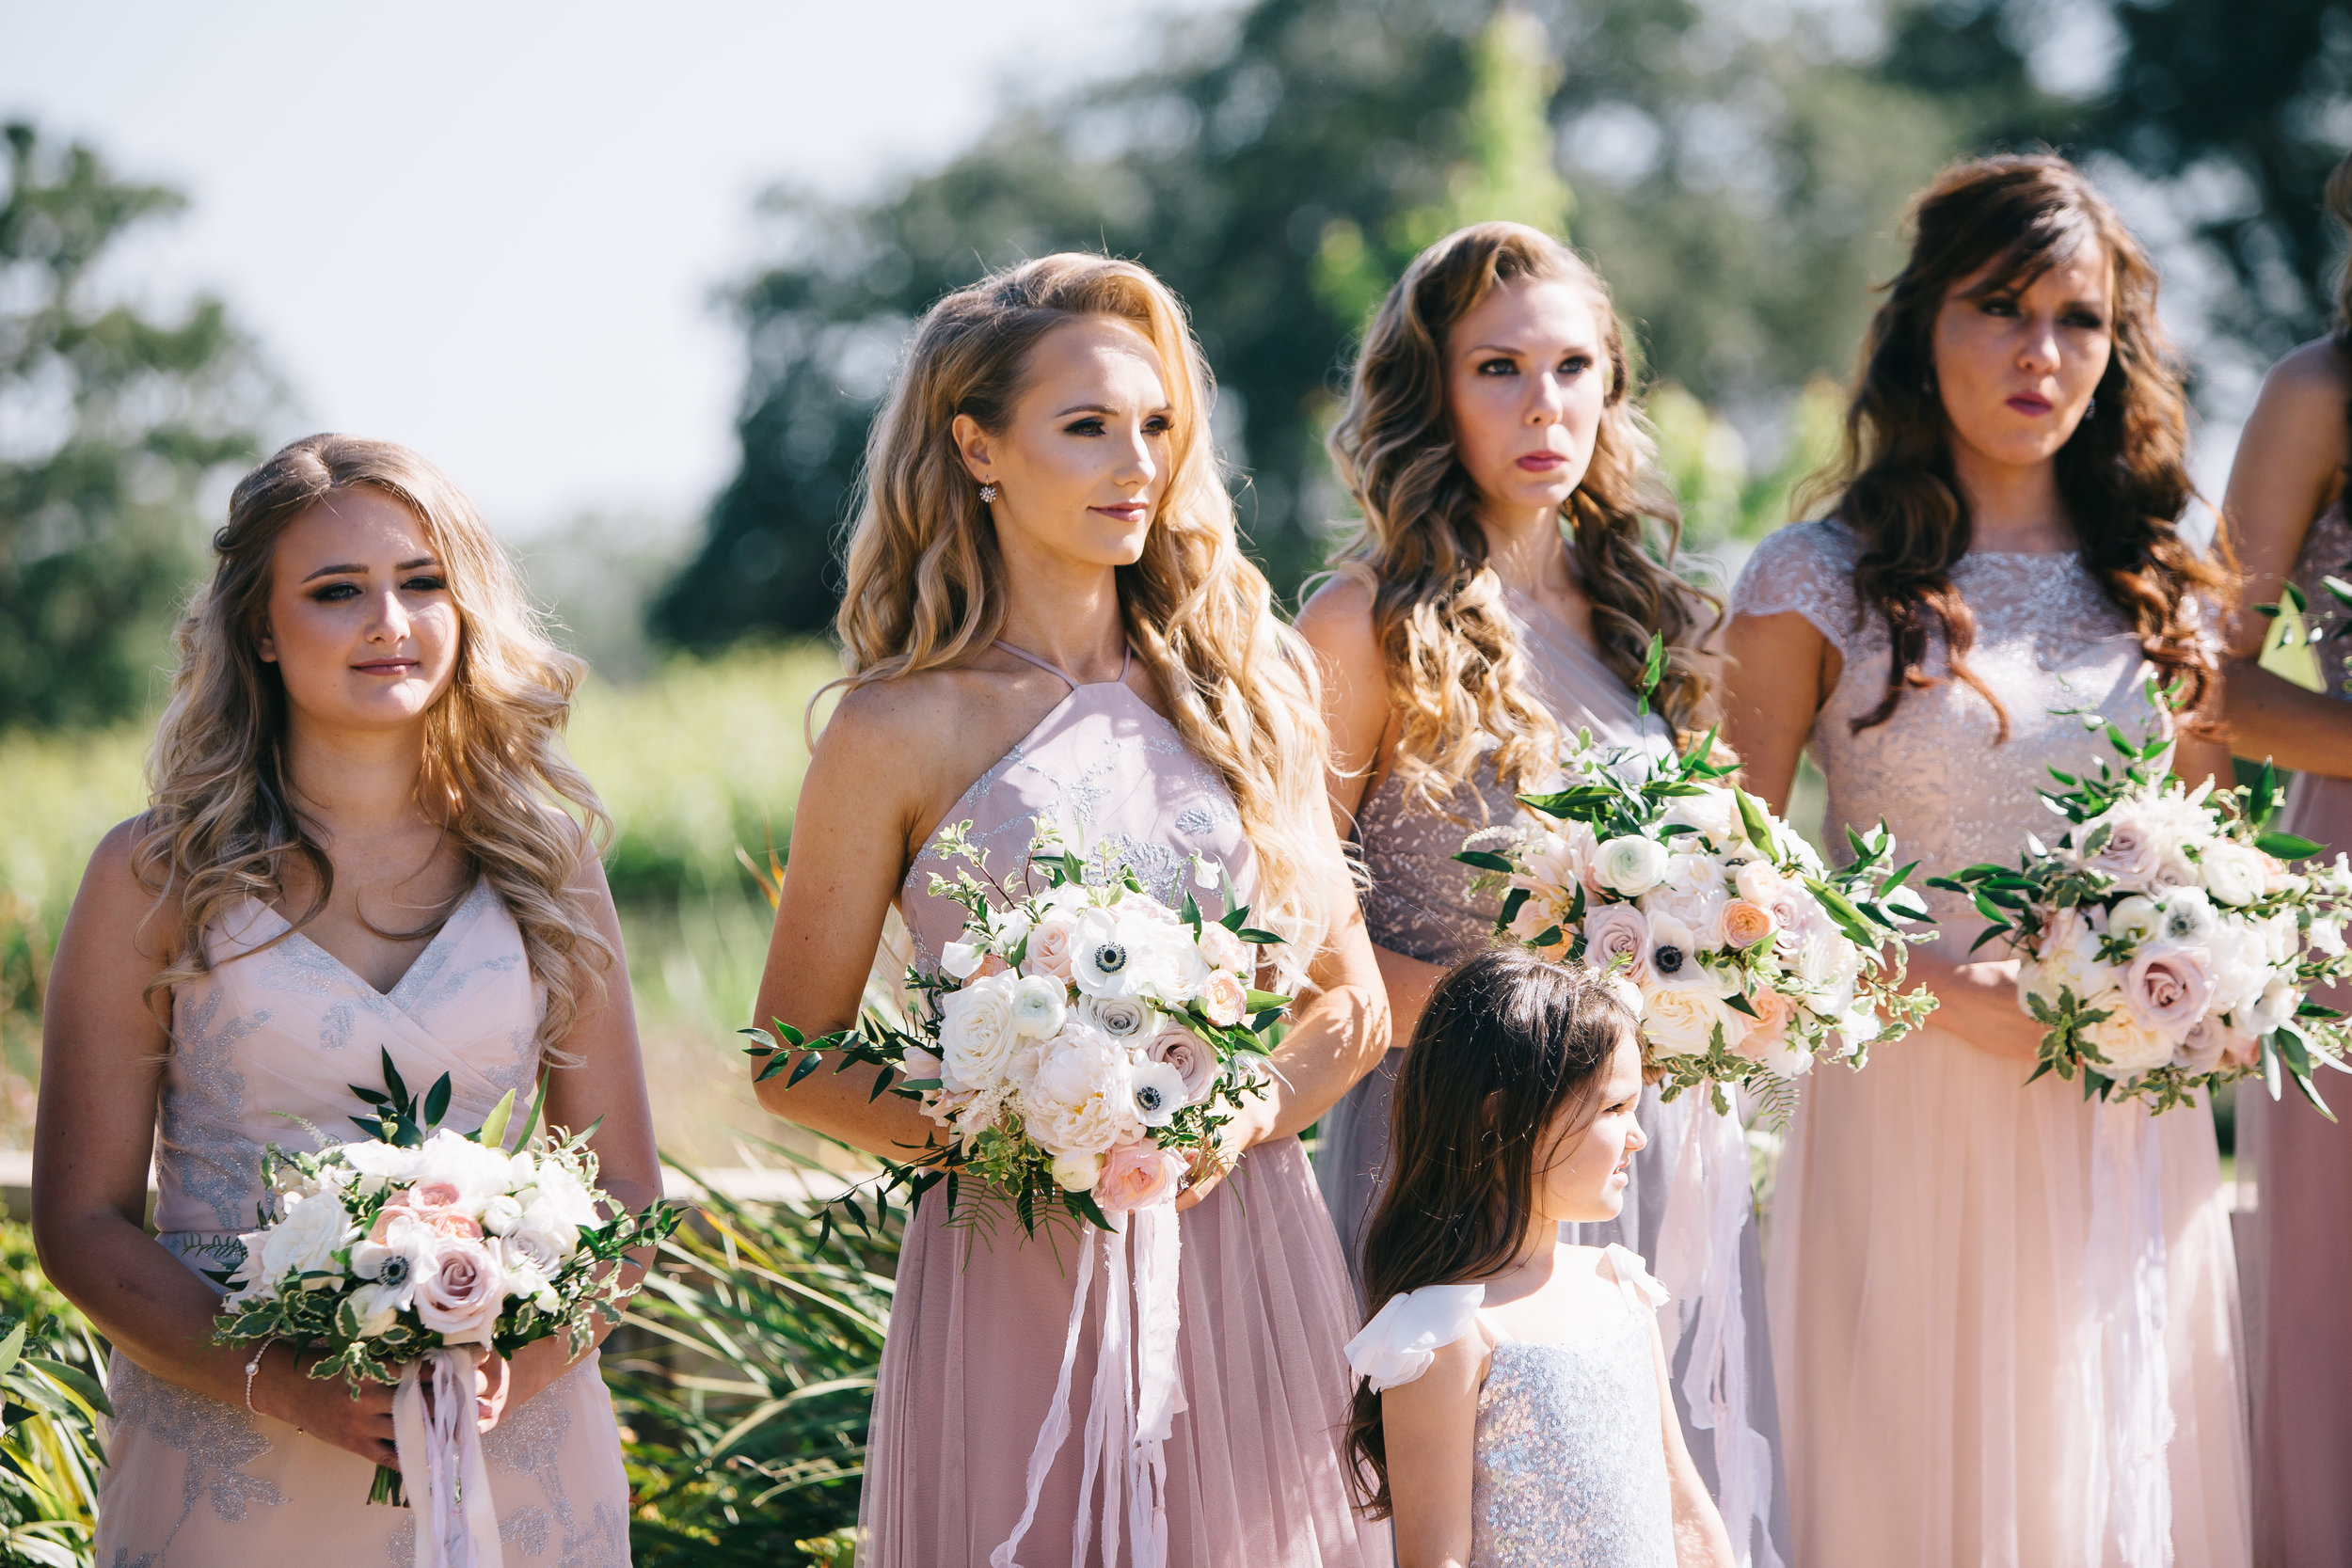 Violette-fleurs-event-design-roseville-anna-perevertaylo-rancho-robles-vinyards-Detail-California-Sacramento-Decor-Destination-Upscale-ceremony.jpg